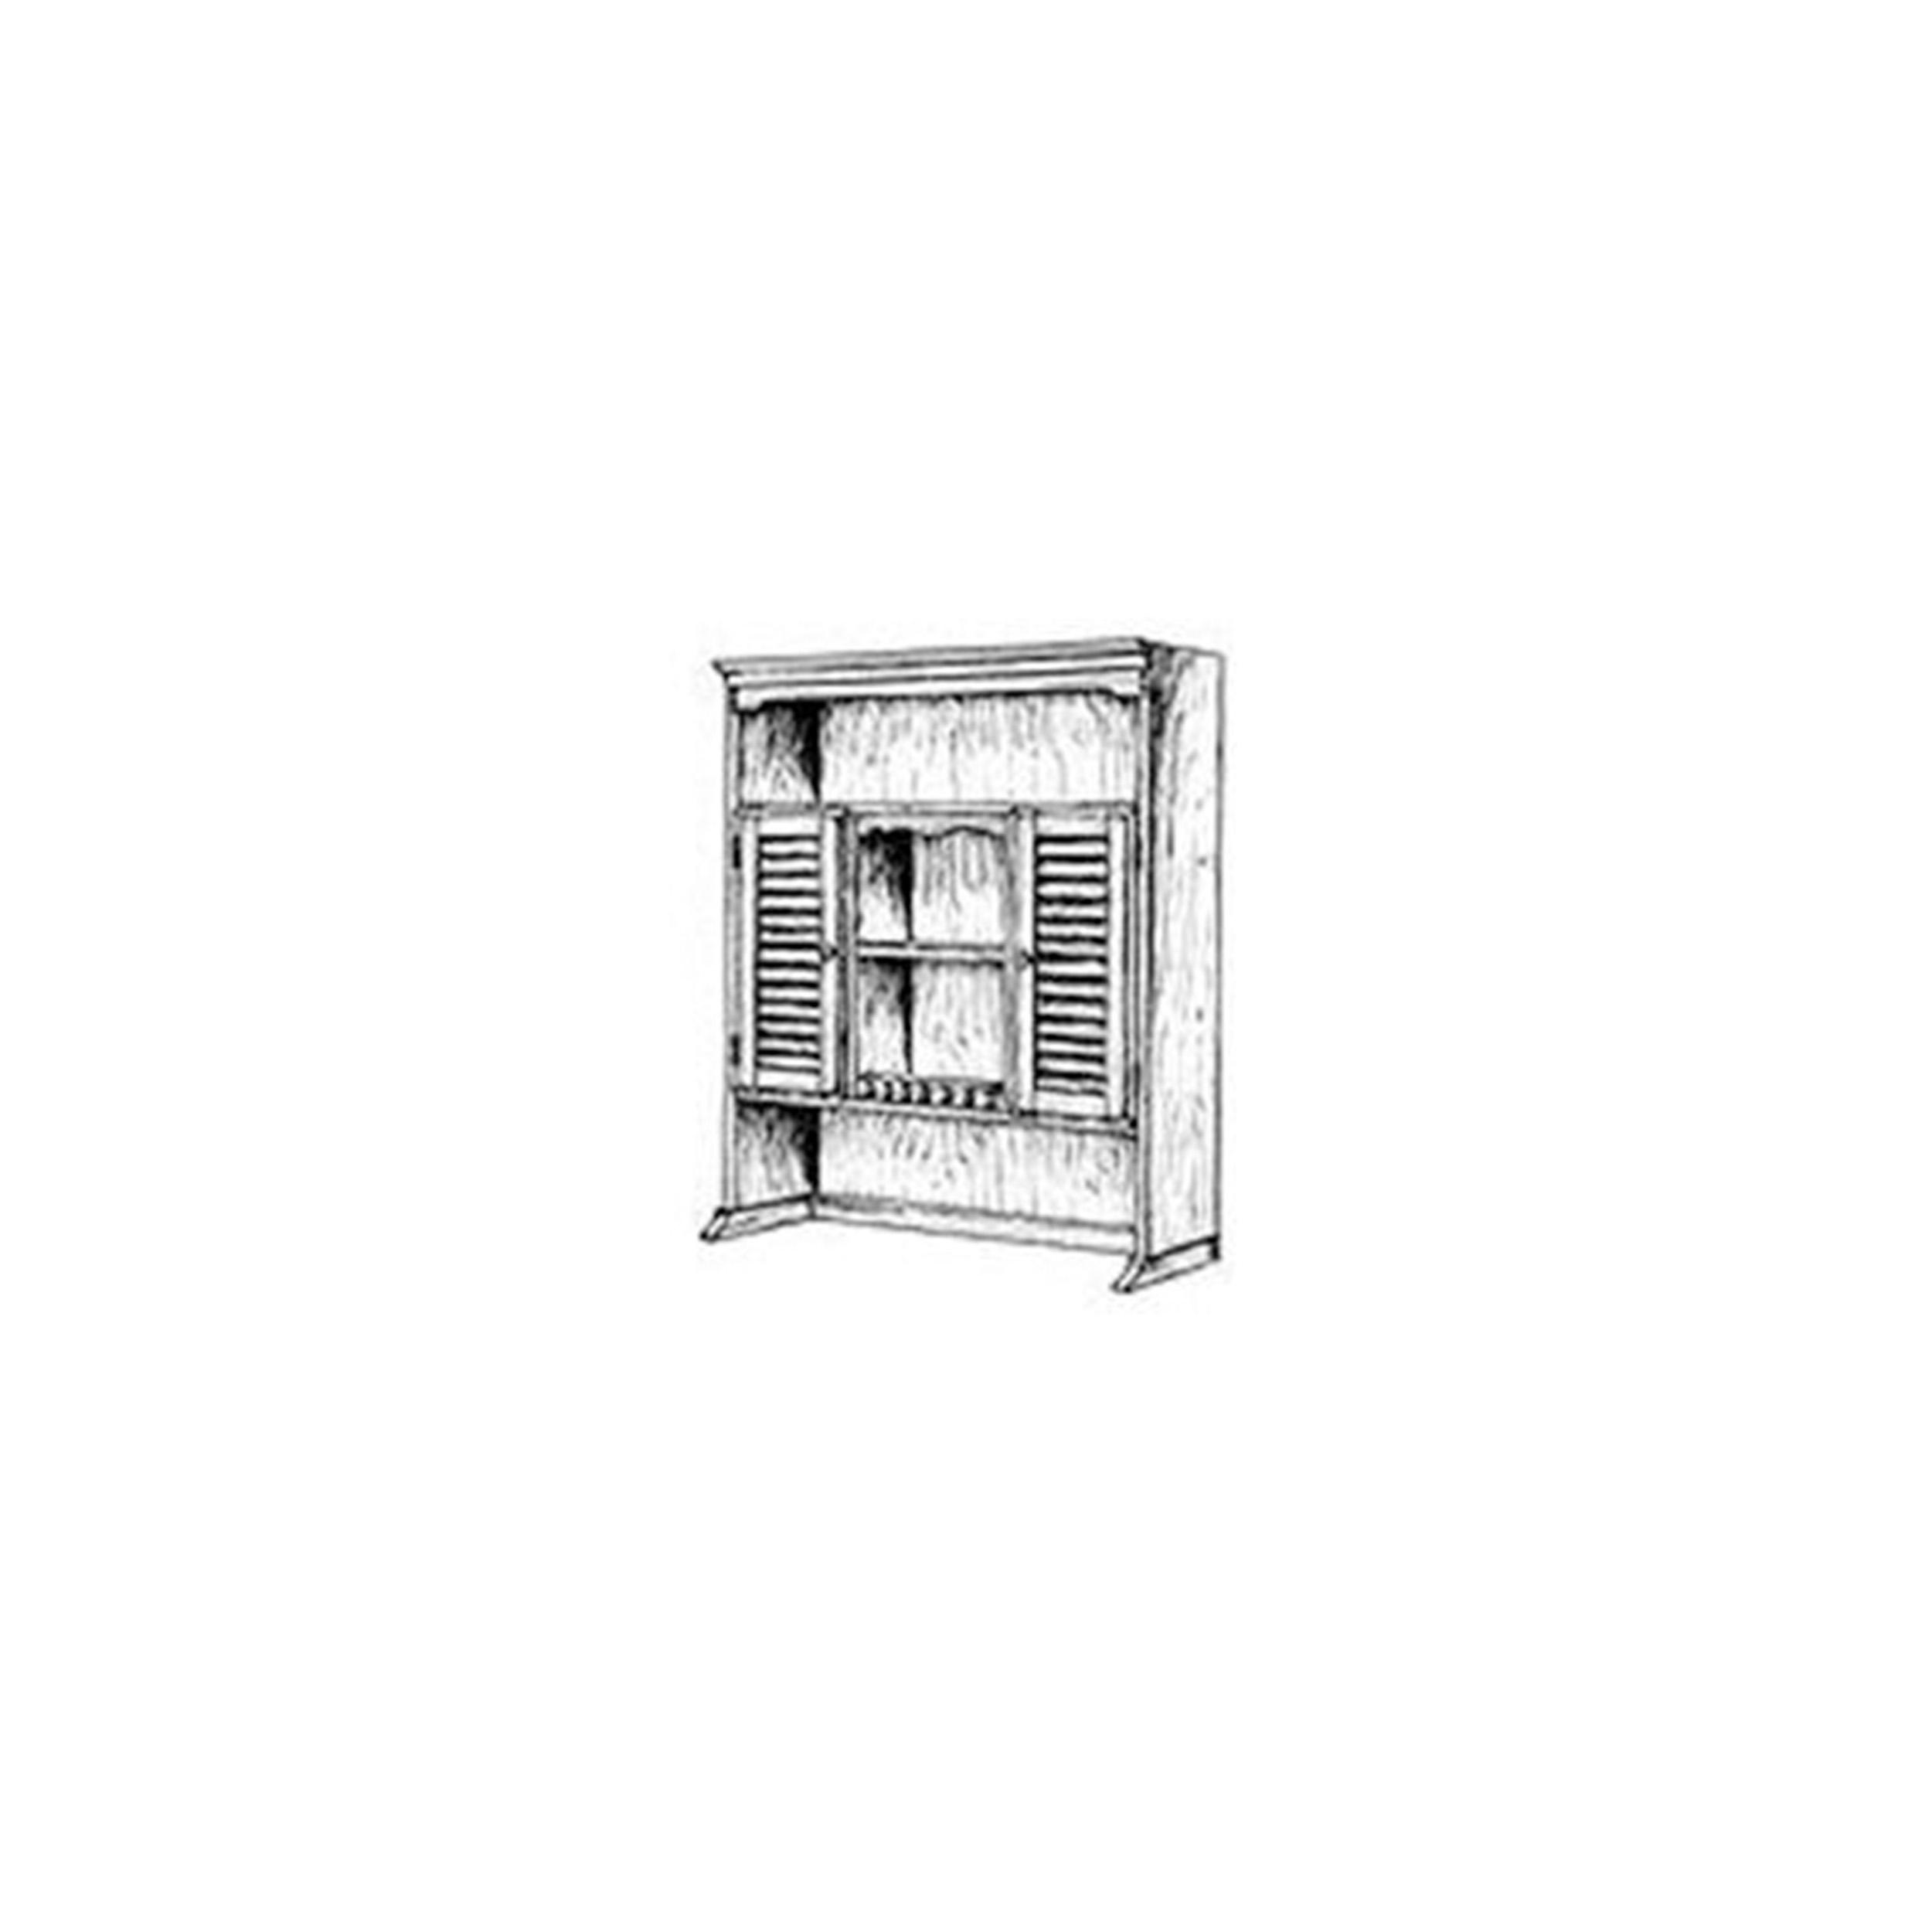 Woodworking Project Paper Plan to Build Bookshelf Hutch Plan II